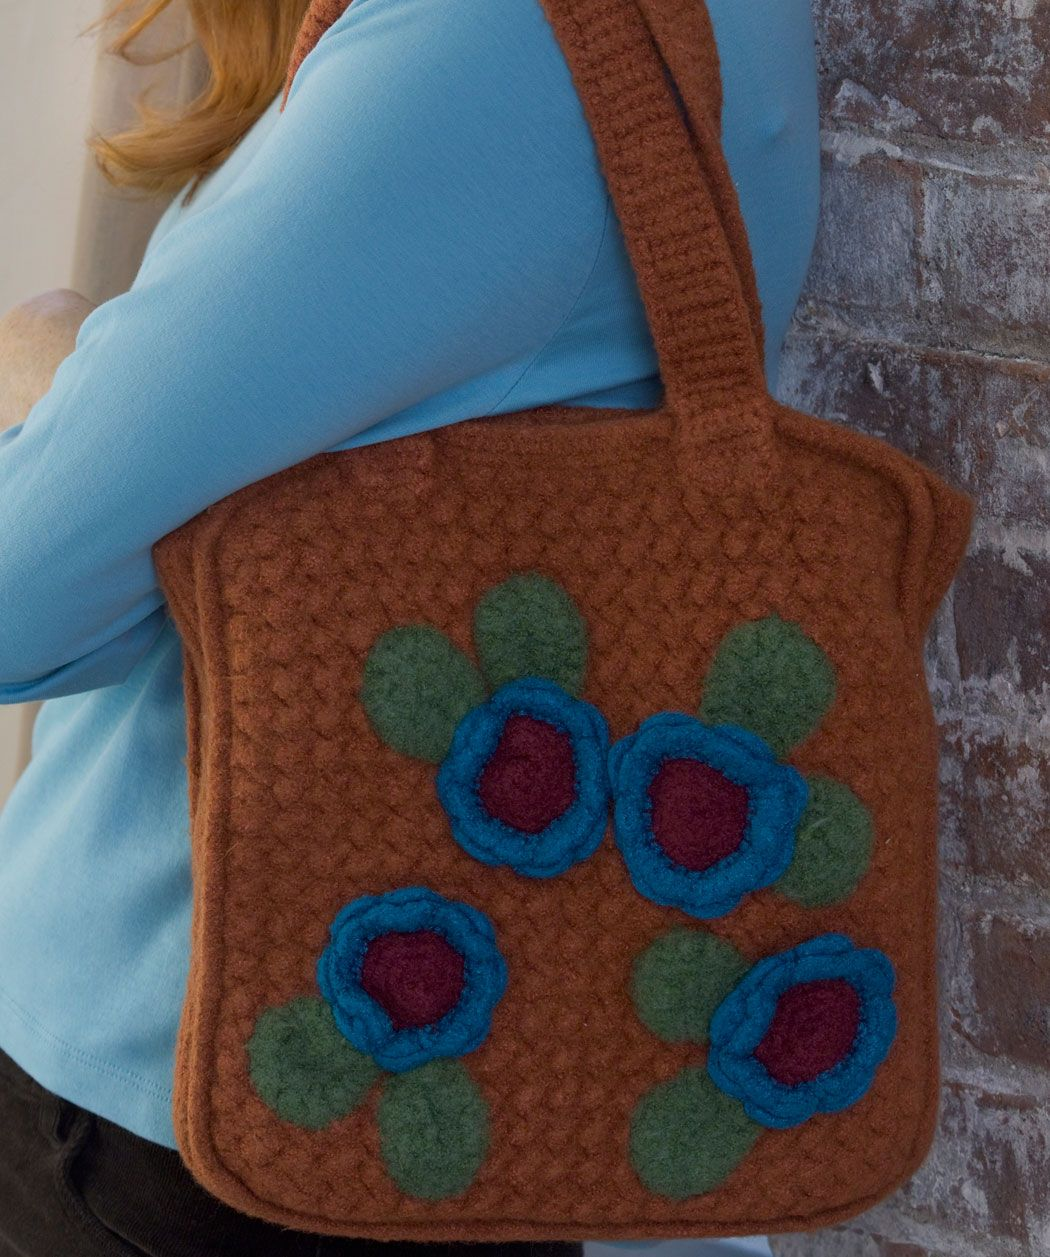 Crochet Posied Felted Bag Red Heart Free Pattern